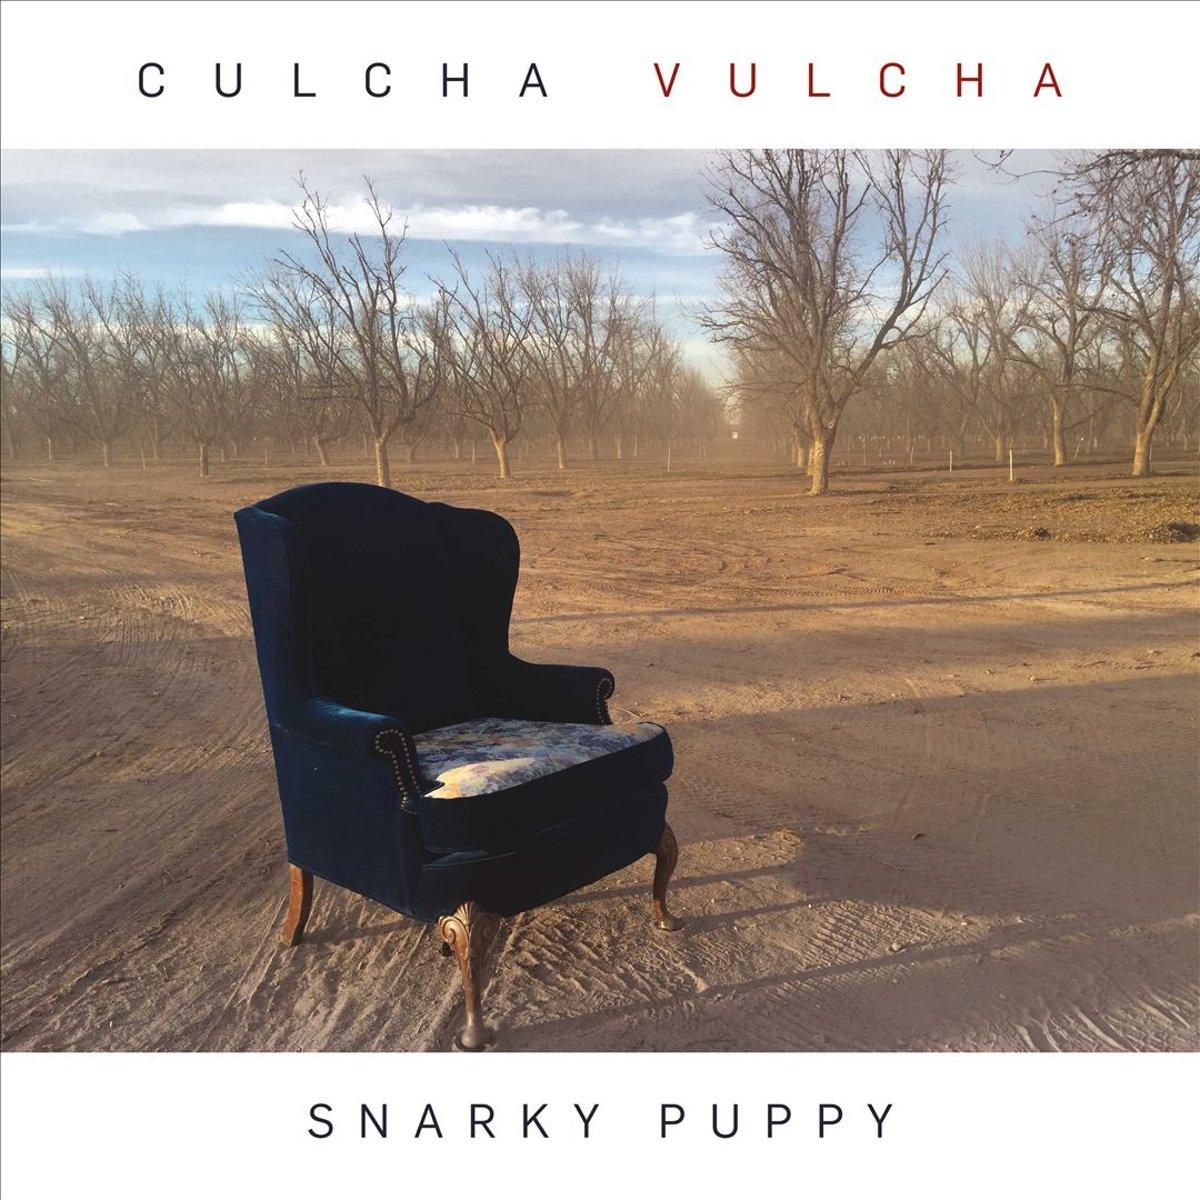 Snarky Puppy - Culcha Vulcha   CD kopen